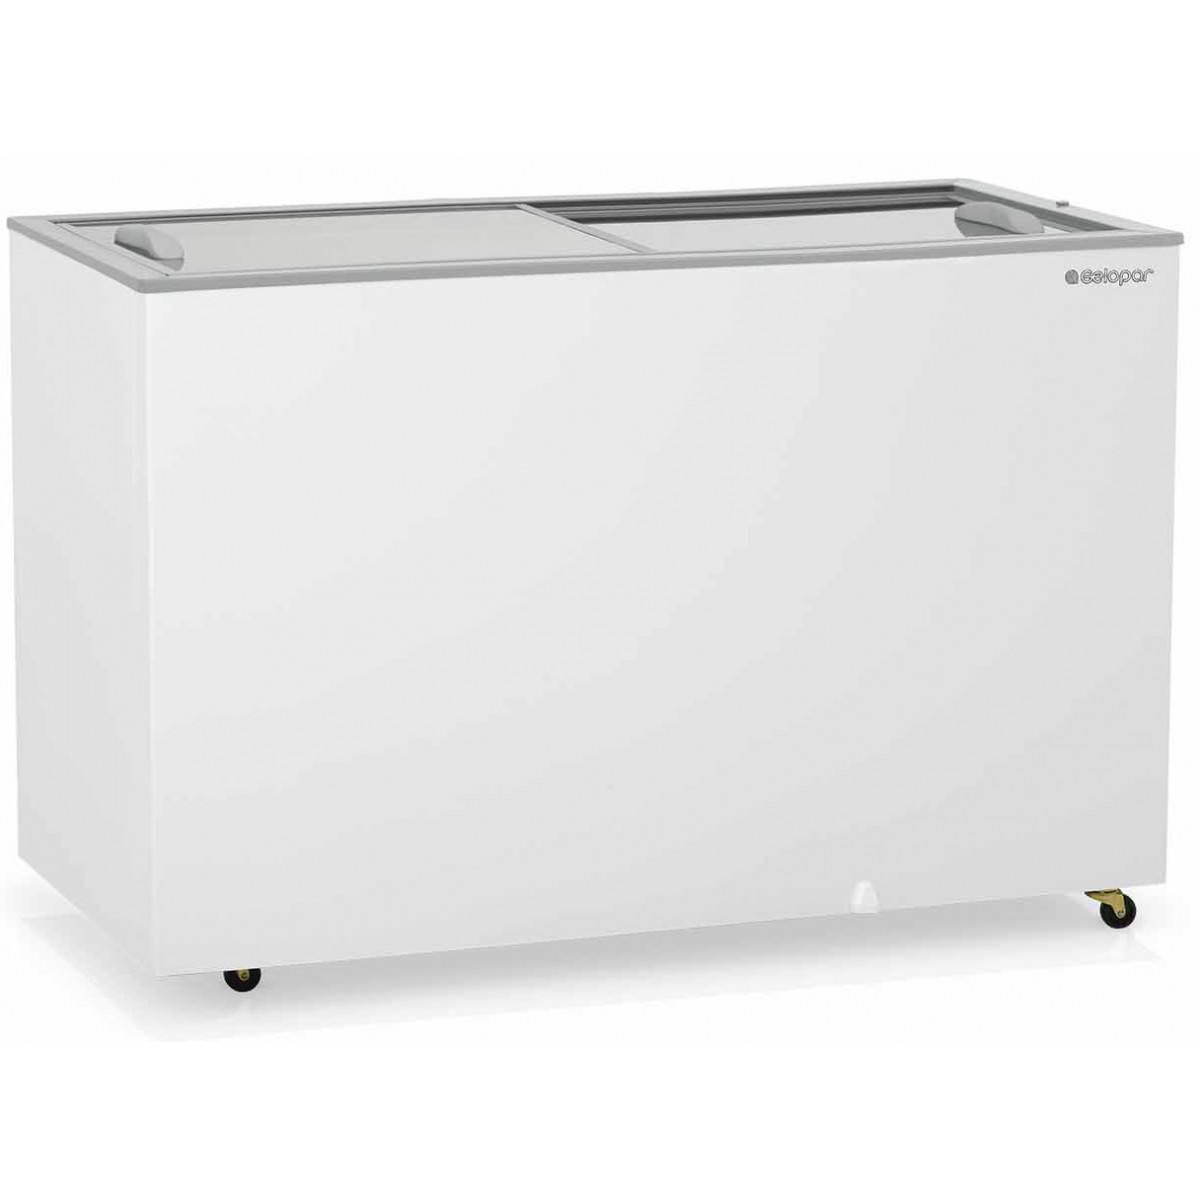 Freezer Gelopar GHDE-410 Vidro Deslizante 340 Litros